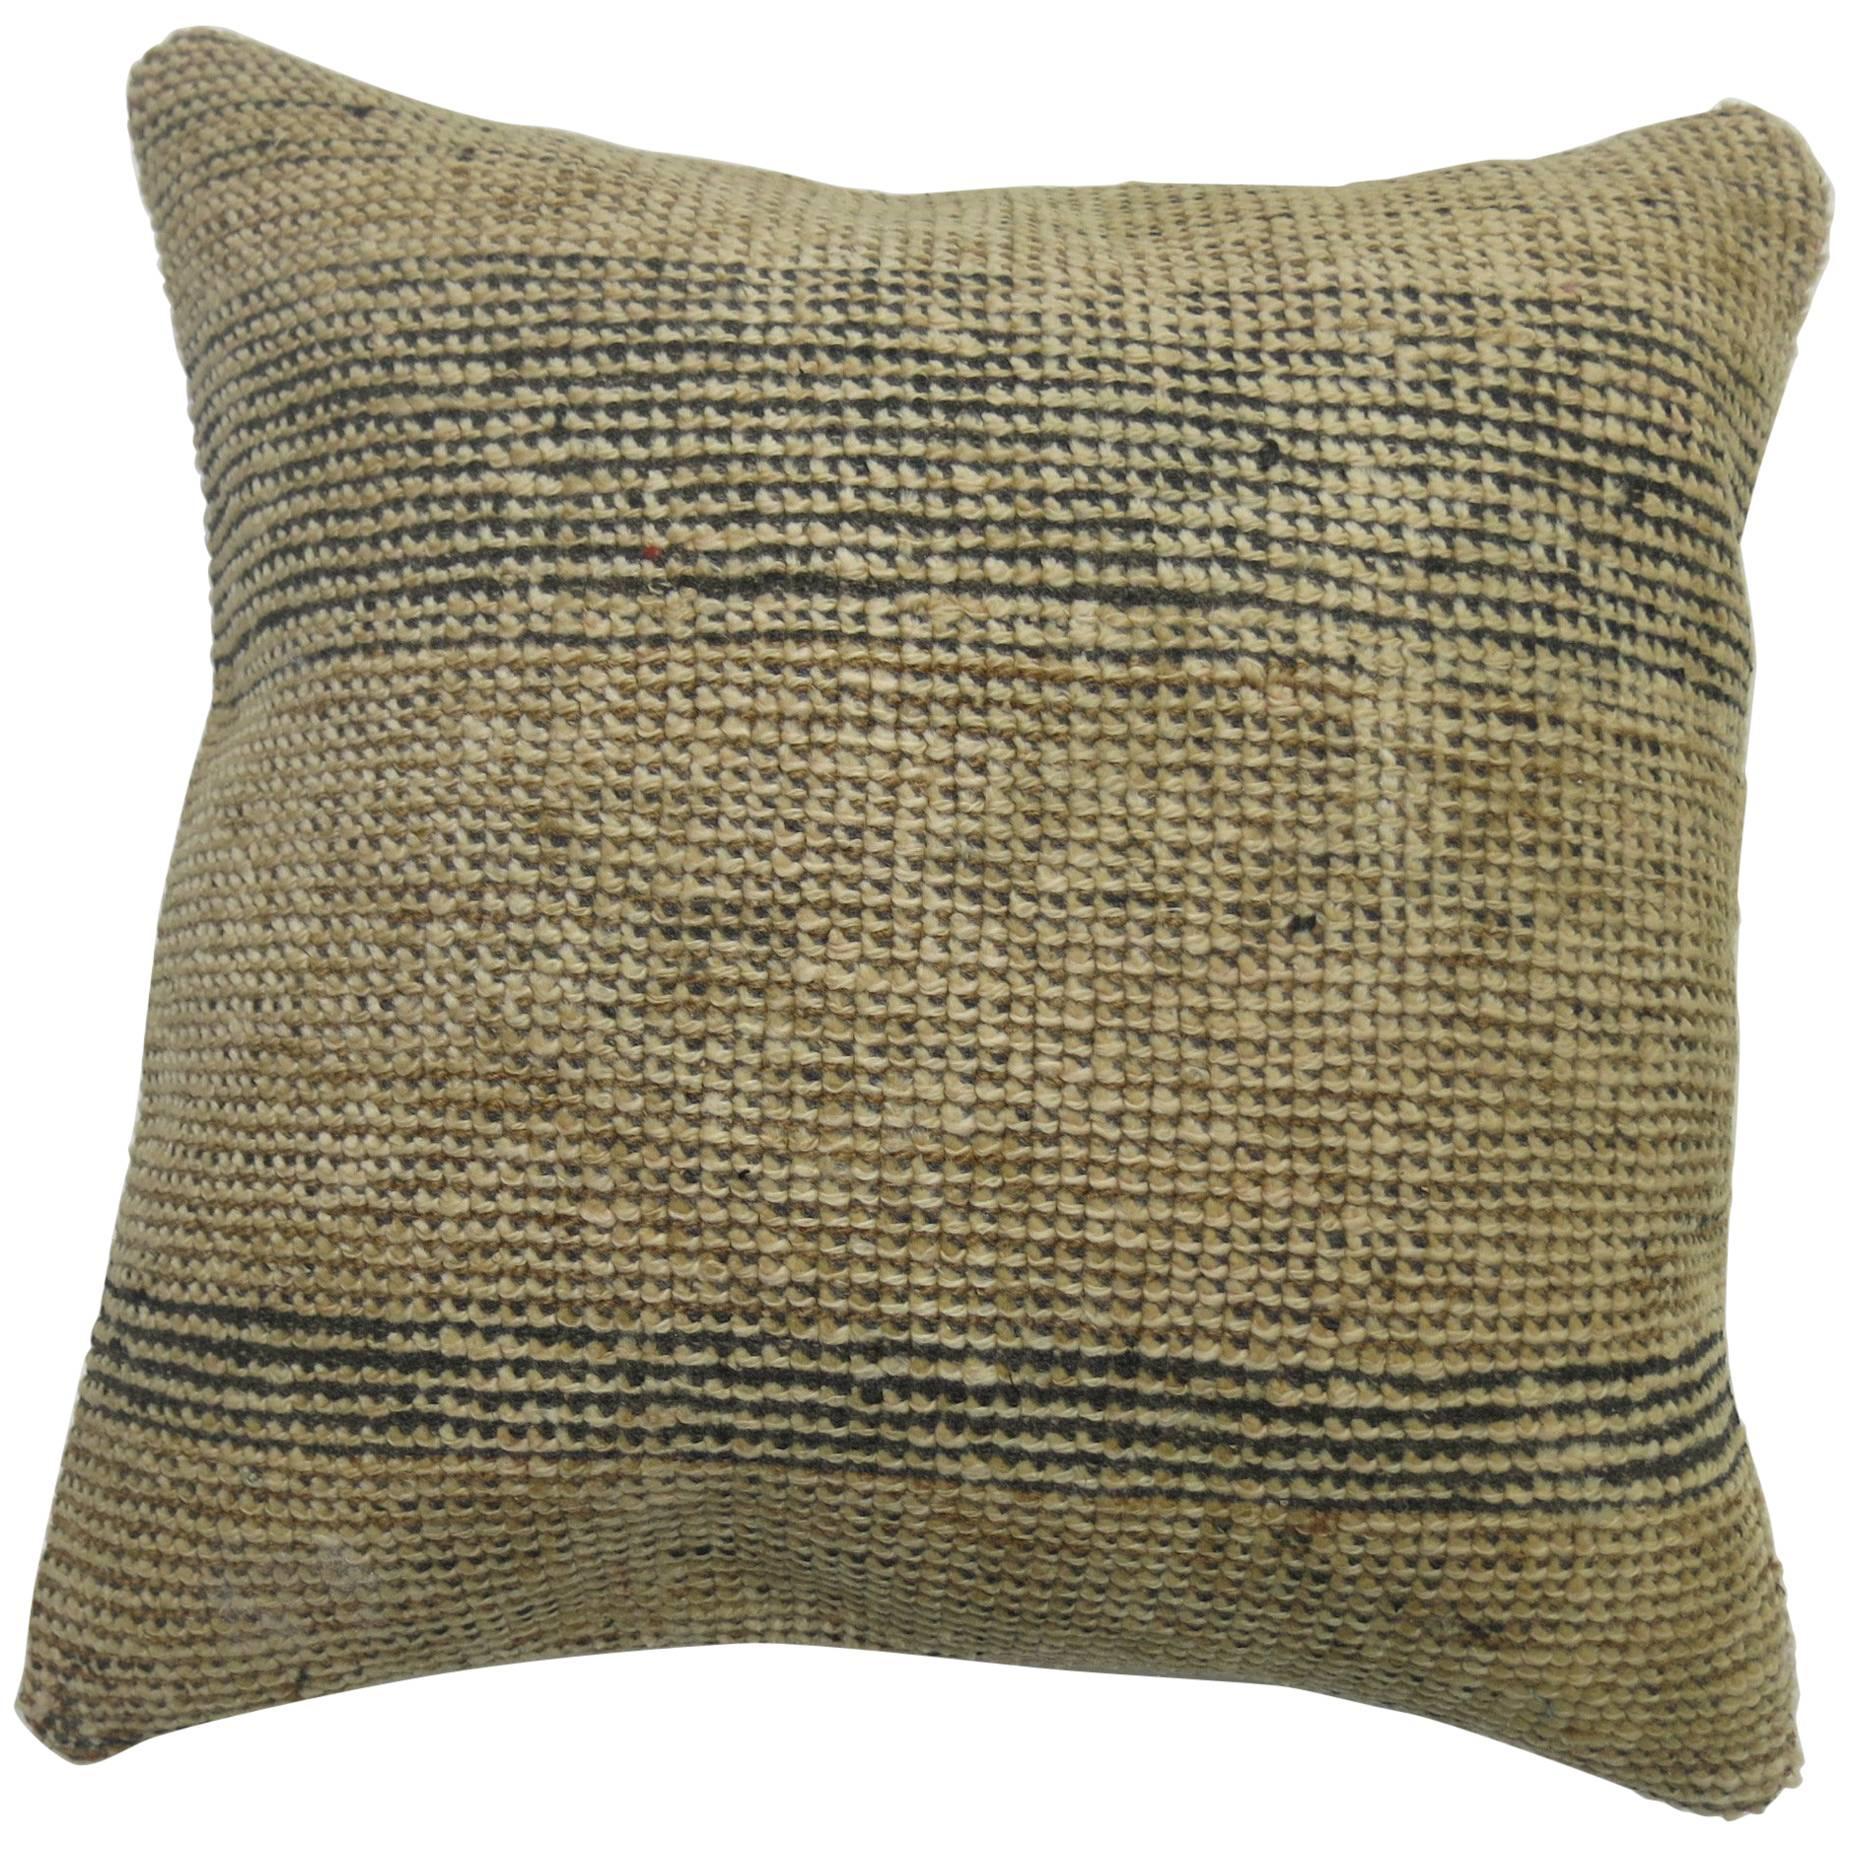 Neutral Moroccan Rug Pillow